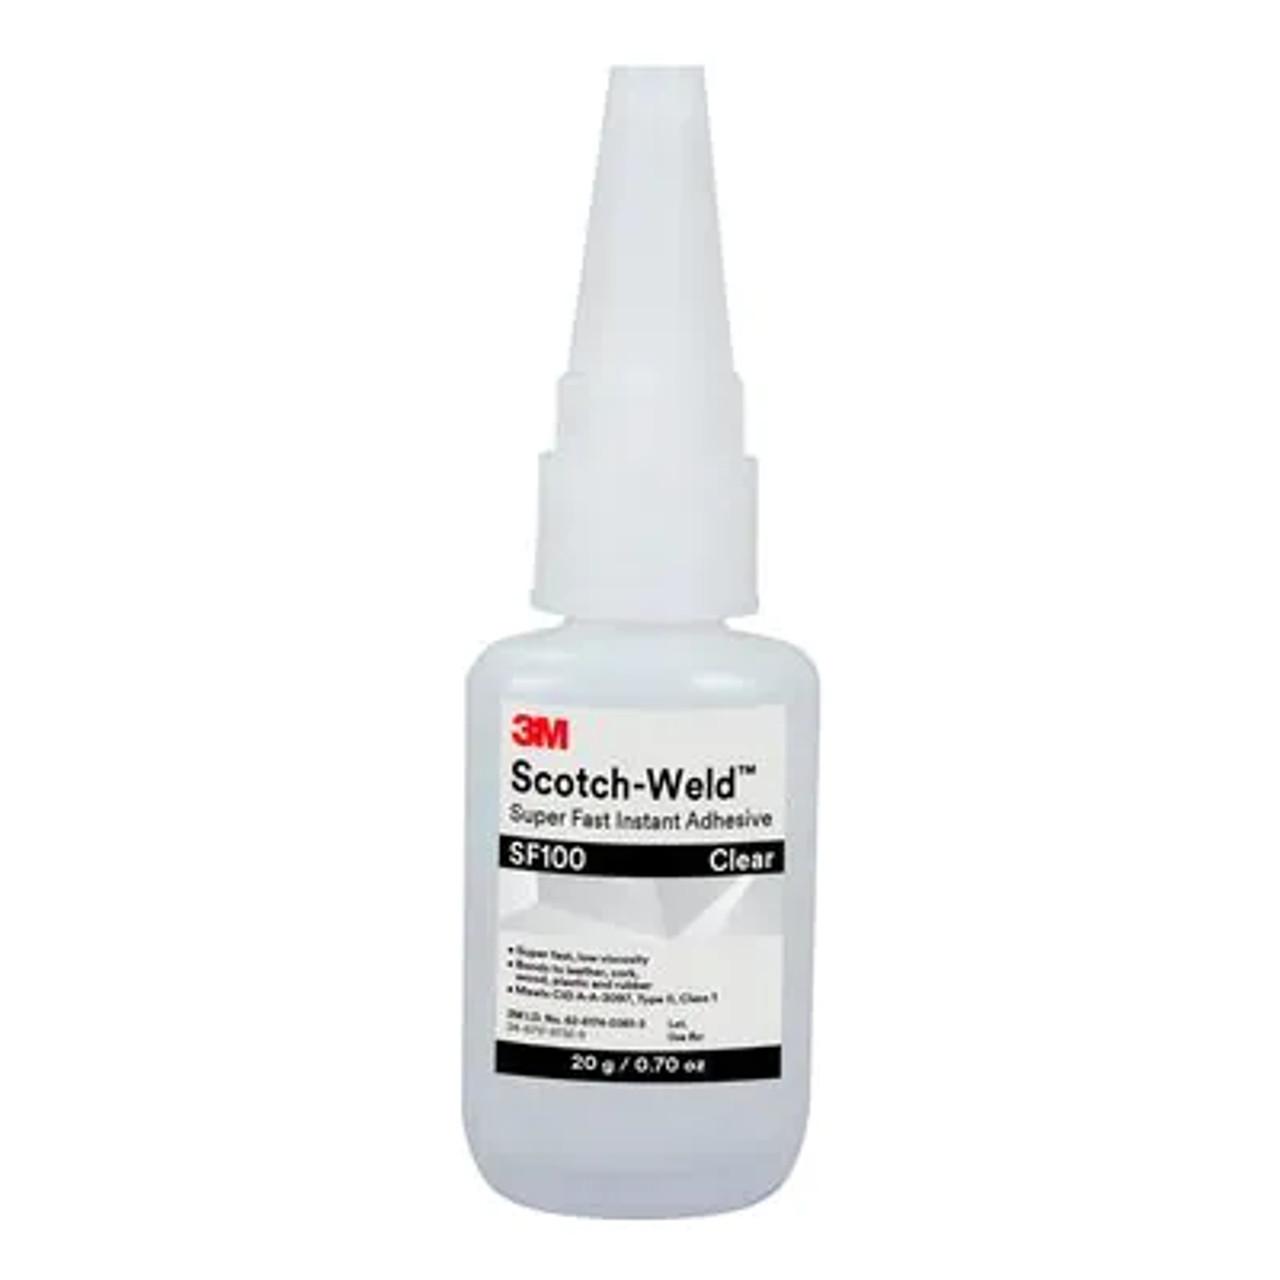 3M™ Scotch-Weld™ Super Fast Instant Adhesive SF100, Clear, 20 Gram Bottle